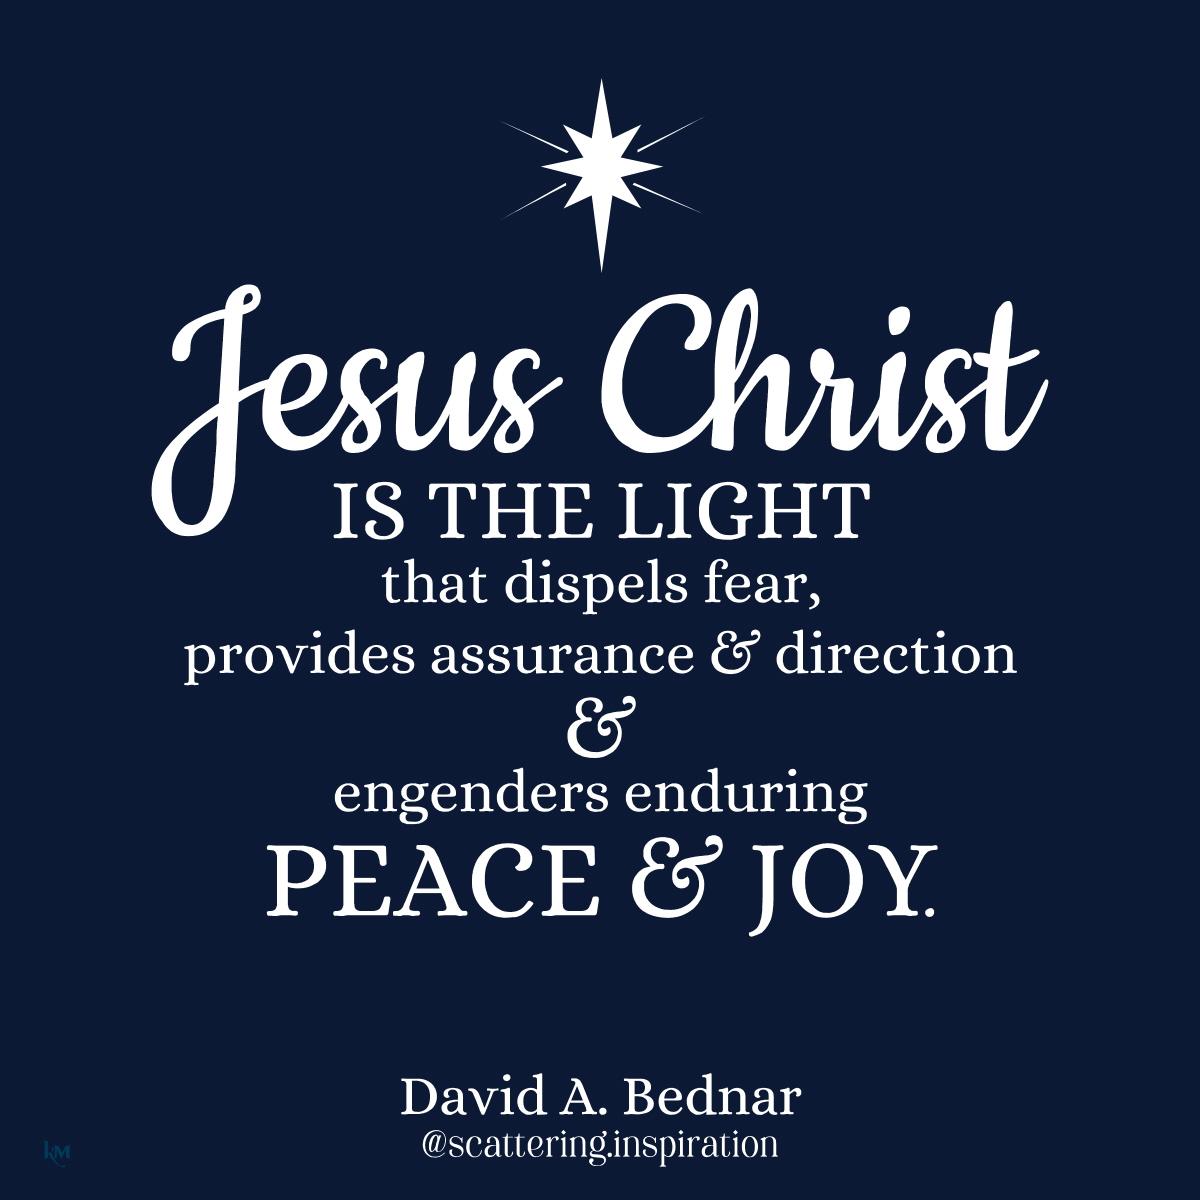 Jesus Christ is the light